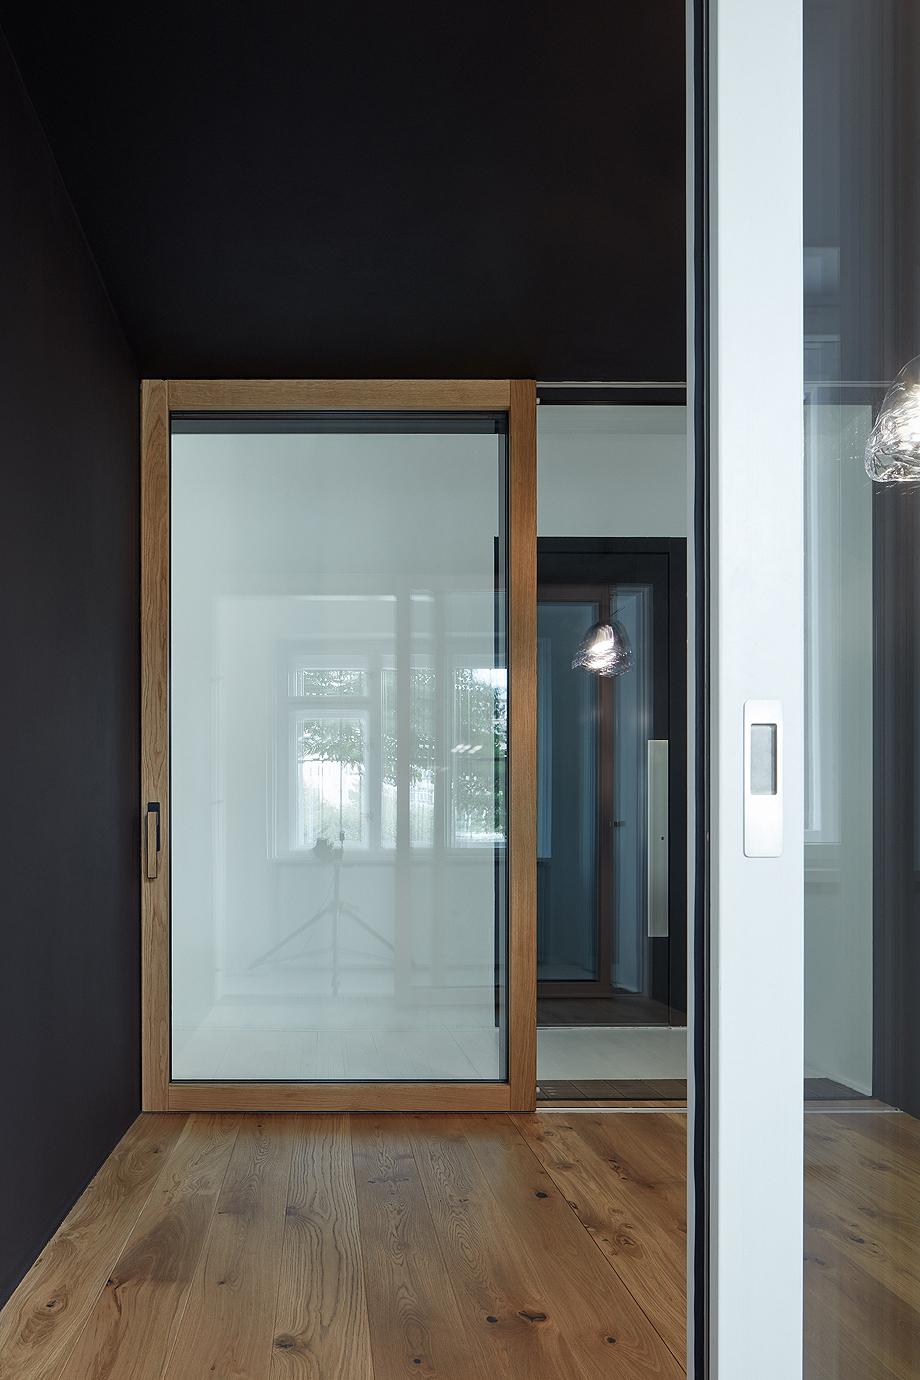 showroom janosik de mjolk architects (18)